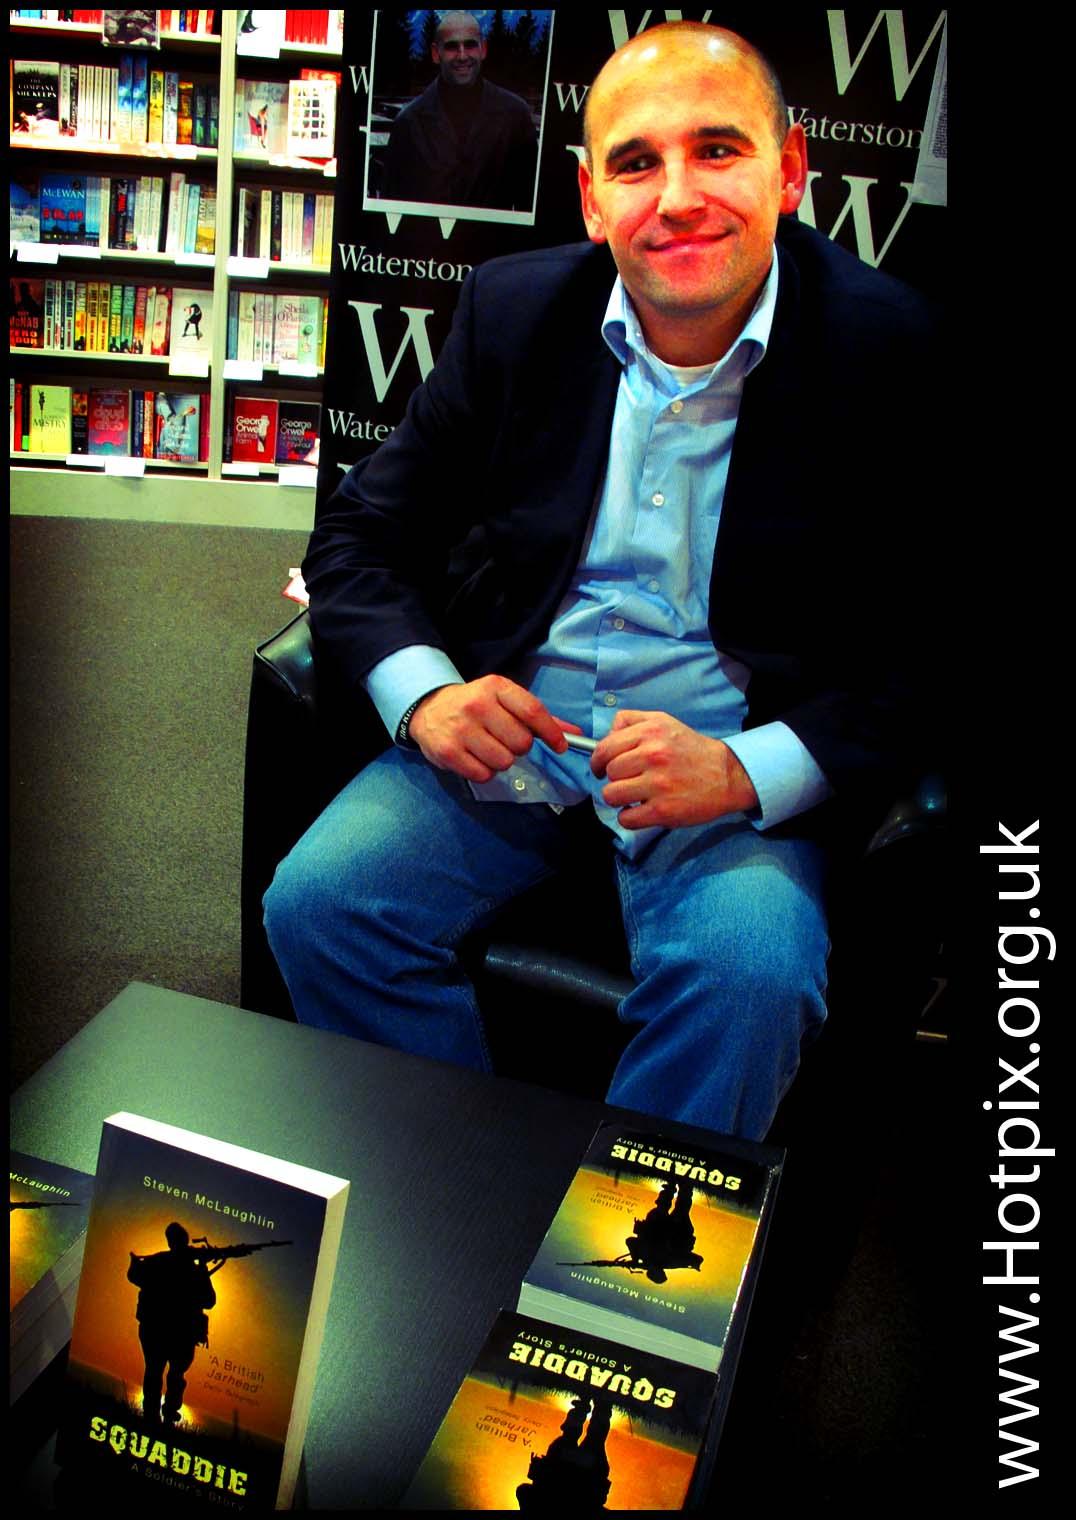 tony,smith,hotpix,tonysmith,tonysmithhotpix,soldier,army,book,signing,Warrington,cheshire,uk,portrait,waterstones,december,2011,dec,dec2011